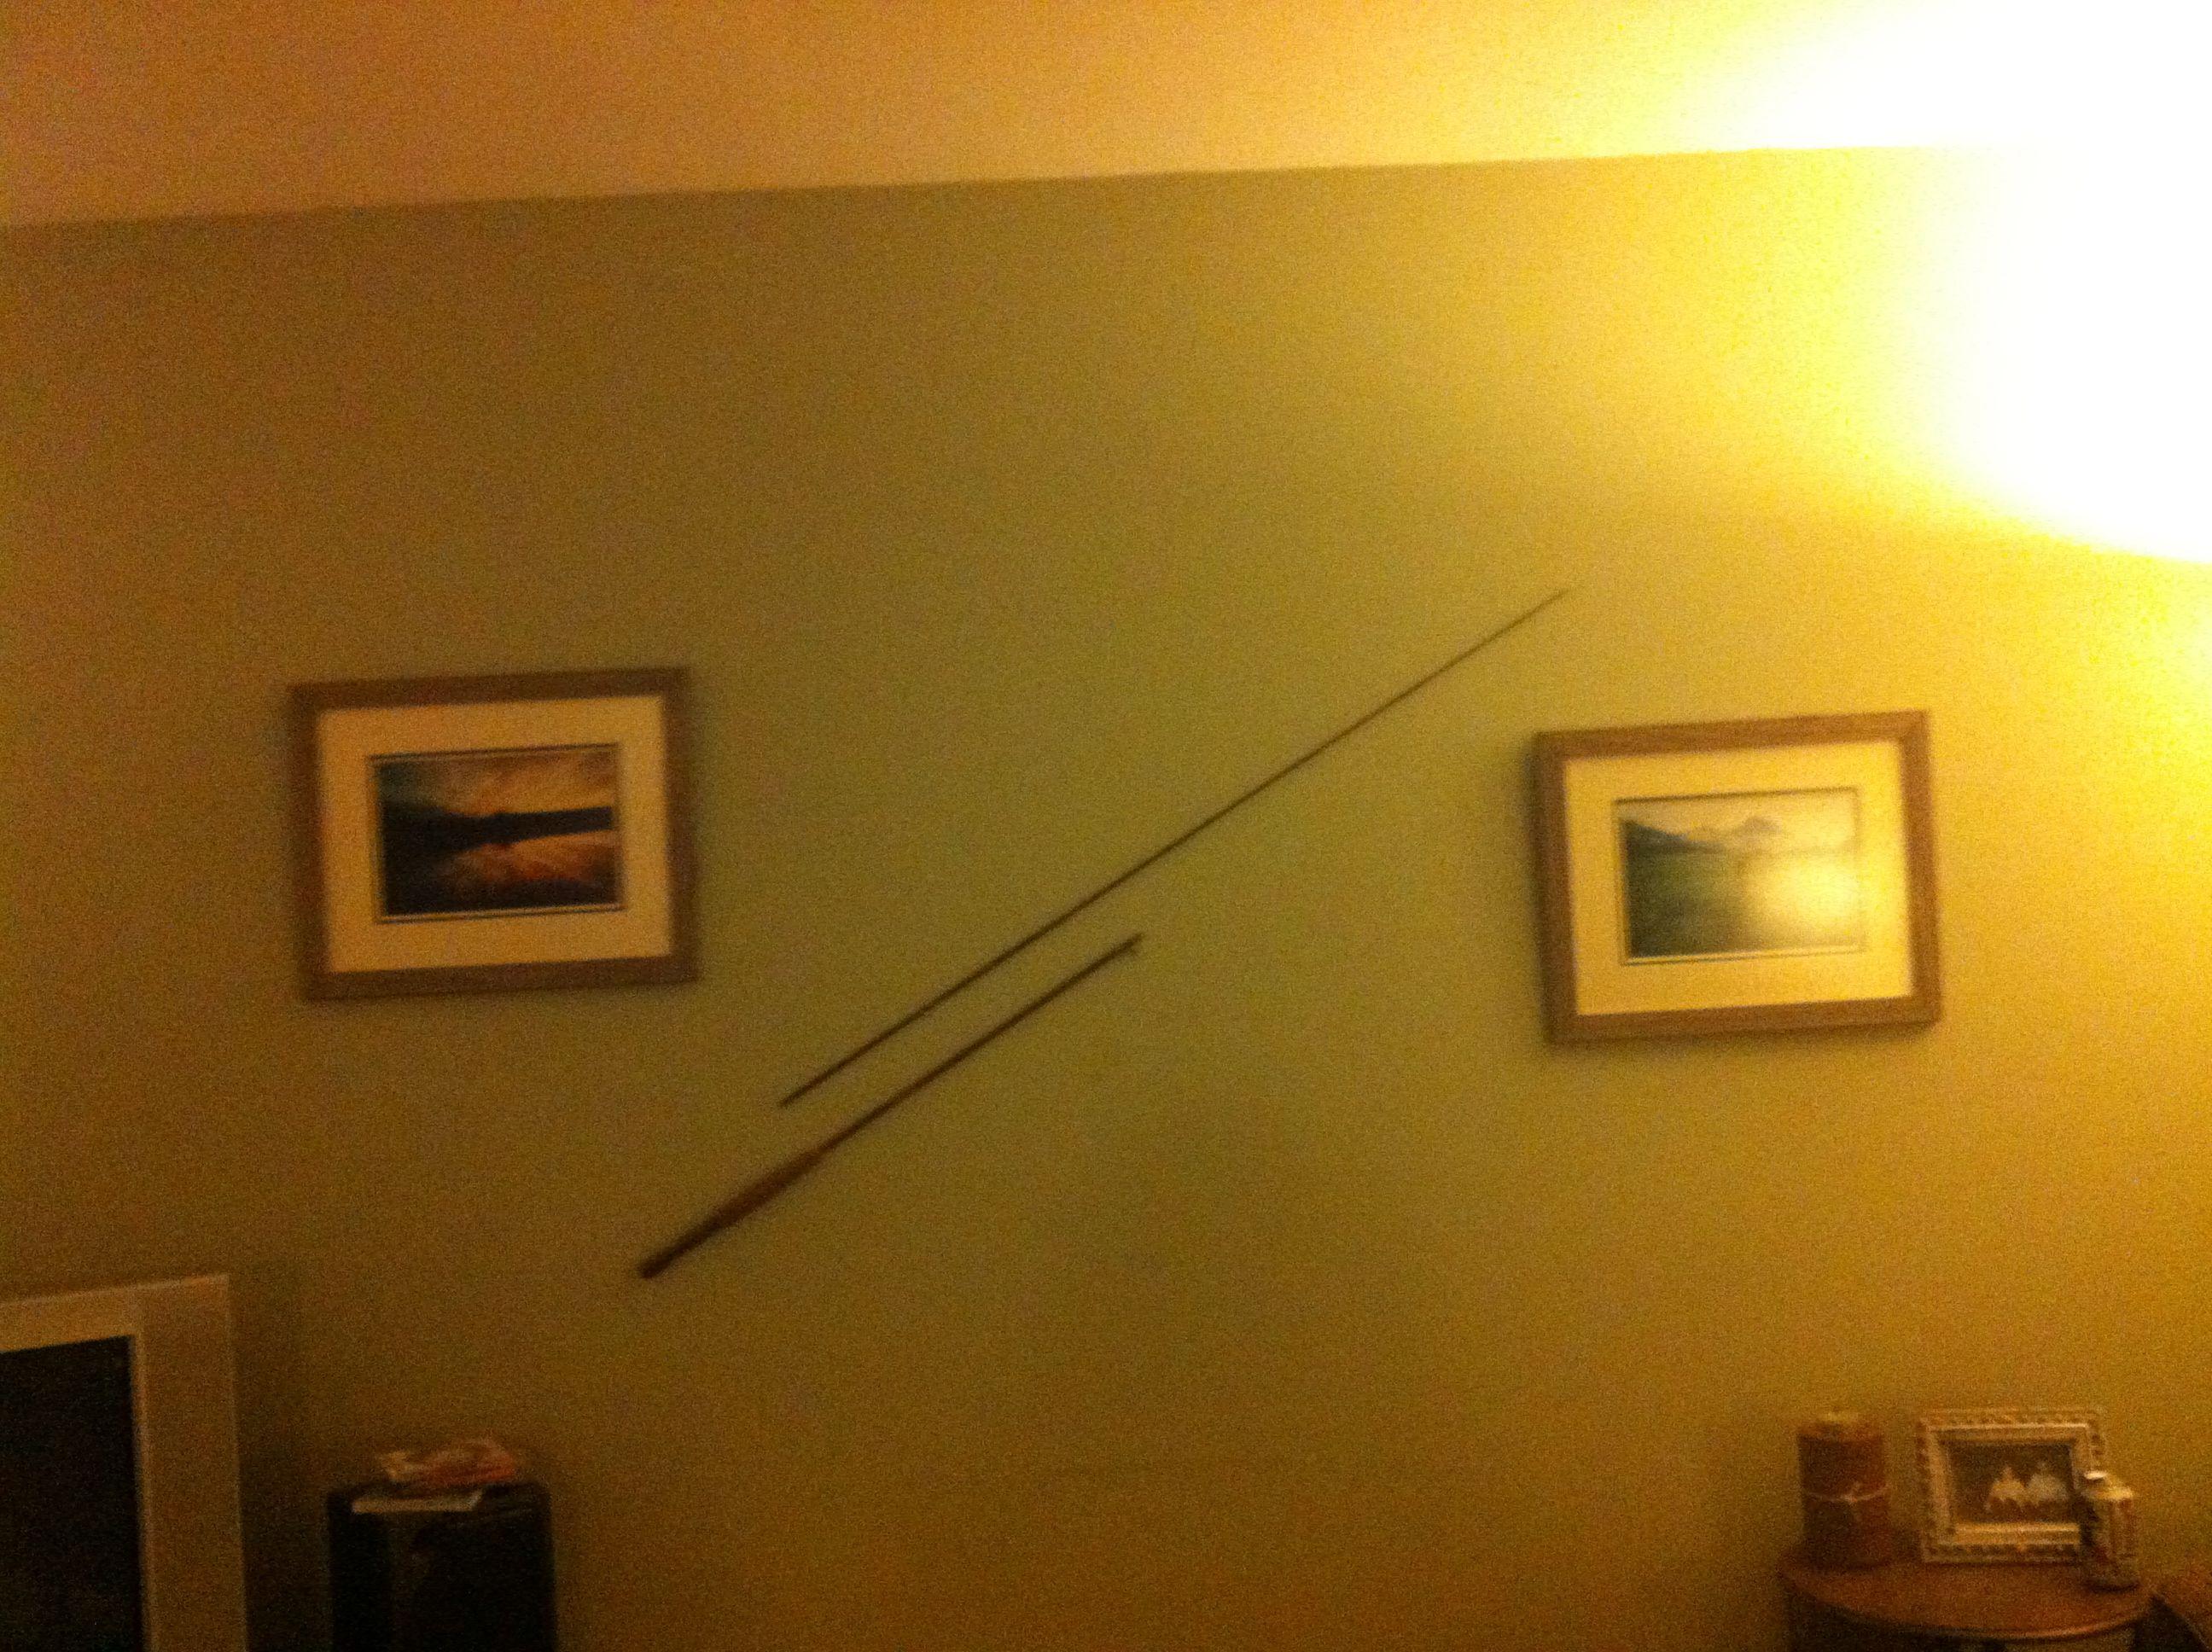 Creative re-use for a broken fishing rod   decor   Pinterest